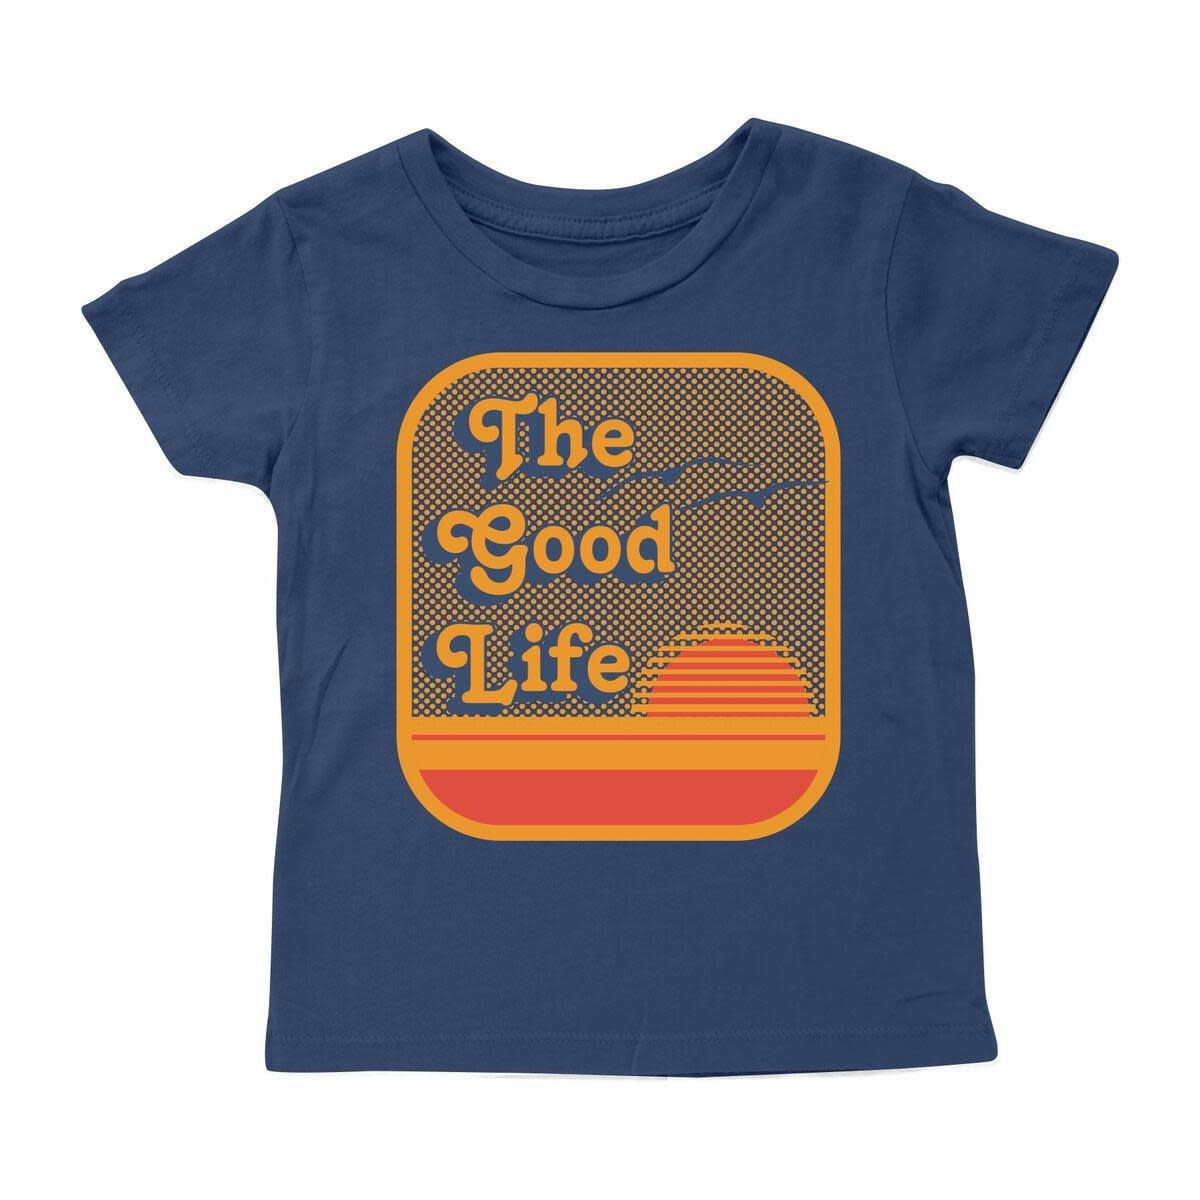 Tiny Whales The Good Life Tee - Navy